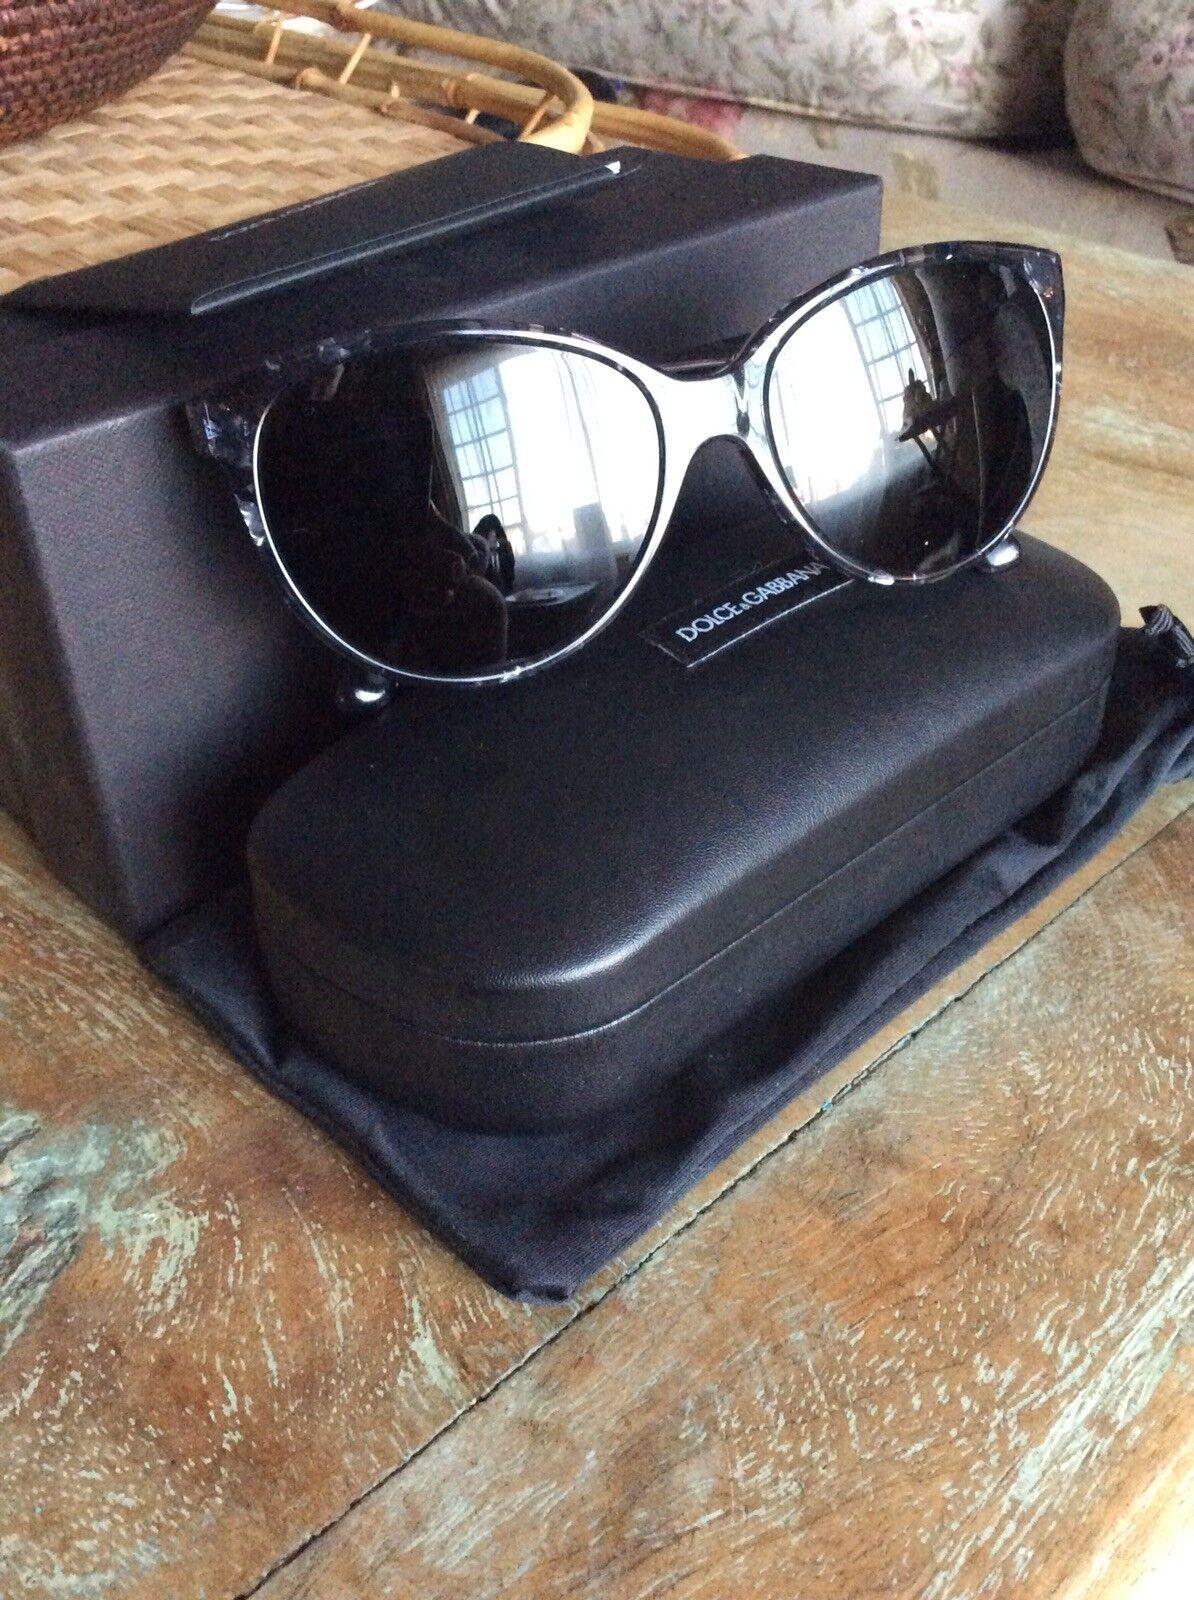 Dolce Gabbana Acrylic Cat Eye Oval Sunglass Frames W/Box, Have Prescription Lens